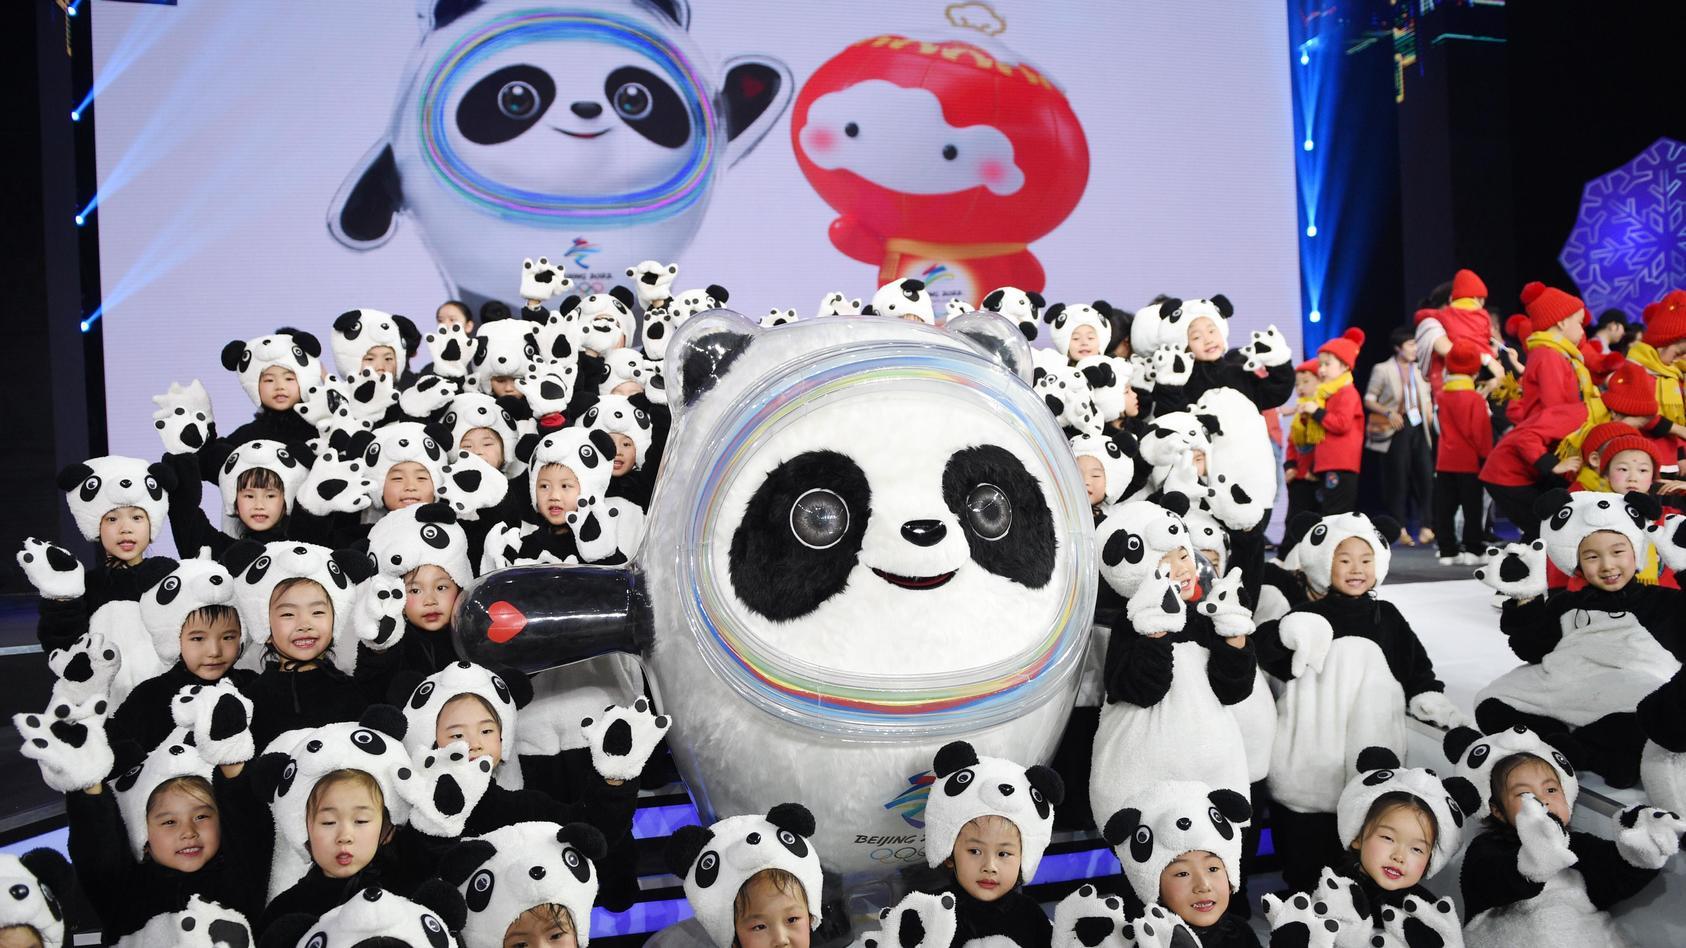 190917 BEIJING Sept 17 2019 Children pose with Bing Dwen Dwen the mascot of Beijing 2022